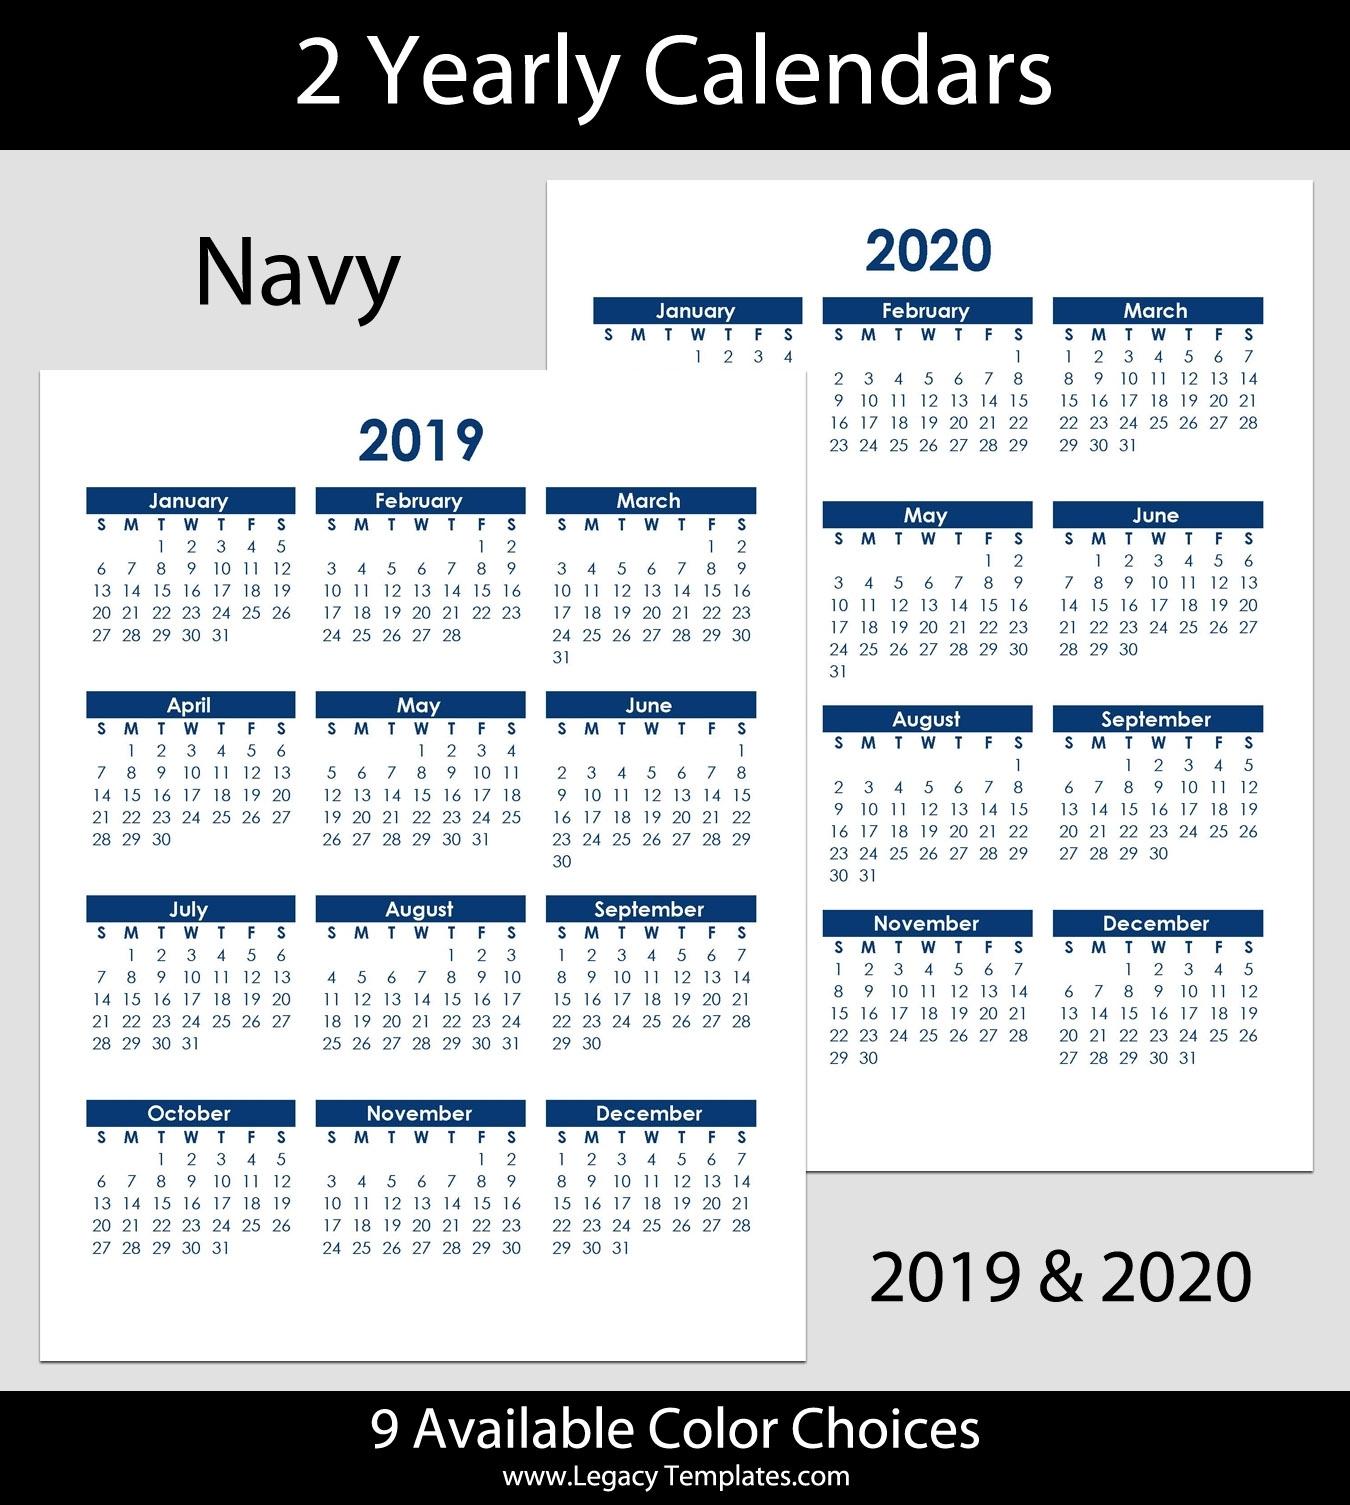 2019 & 2020 Yearly Calendar – 8.5 X 11 | Legacy Templates for 2020 Calendar 8.5 X 11